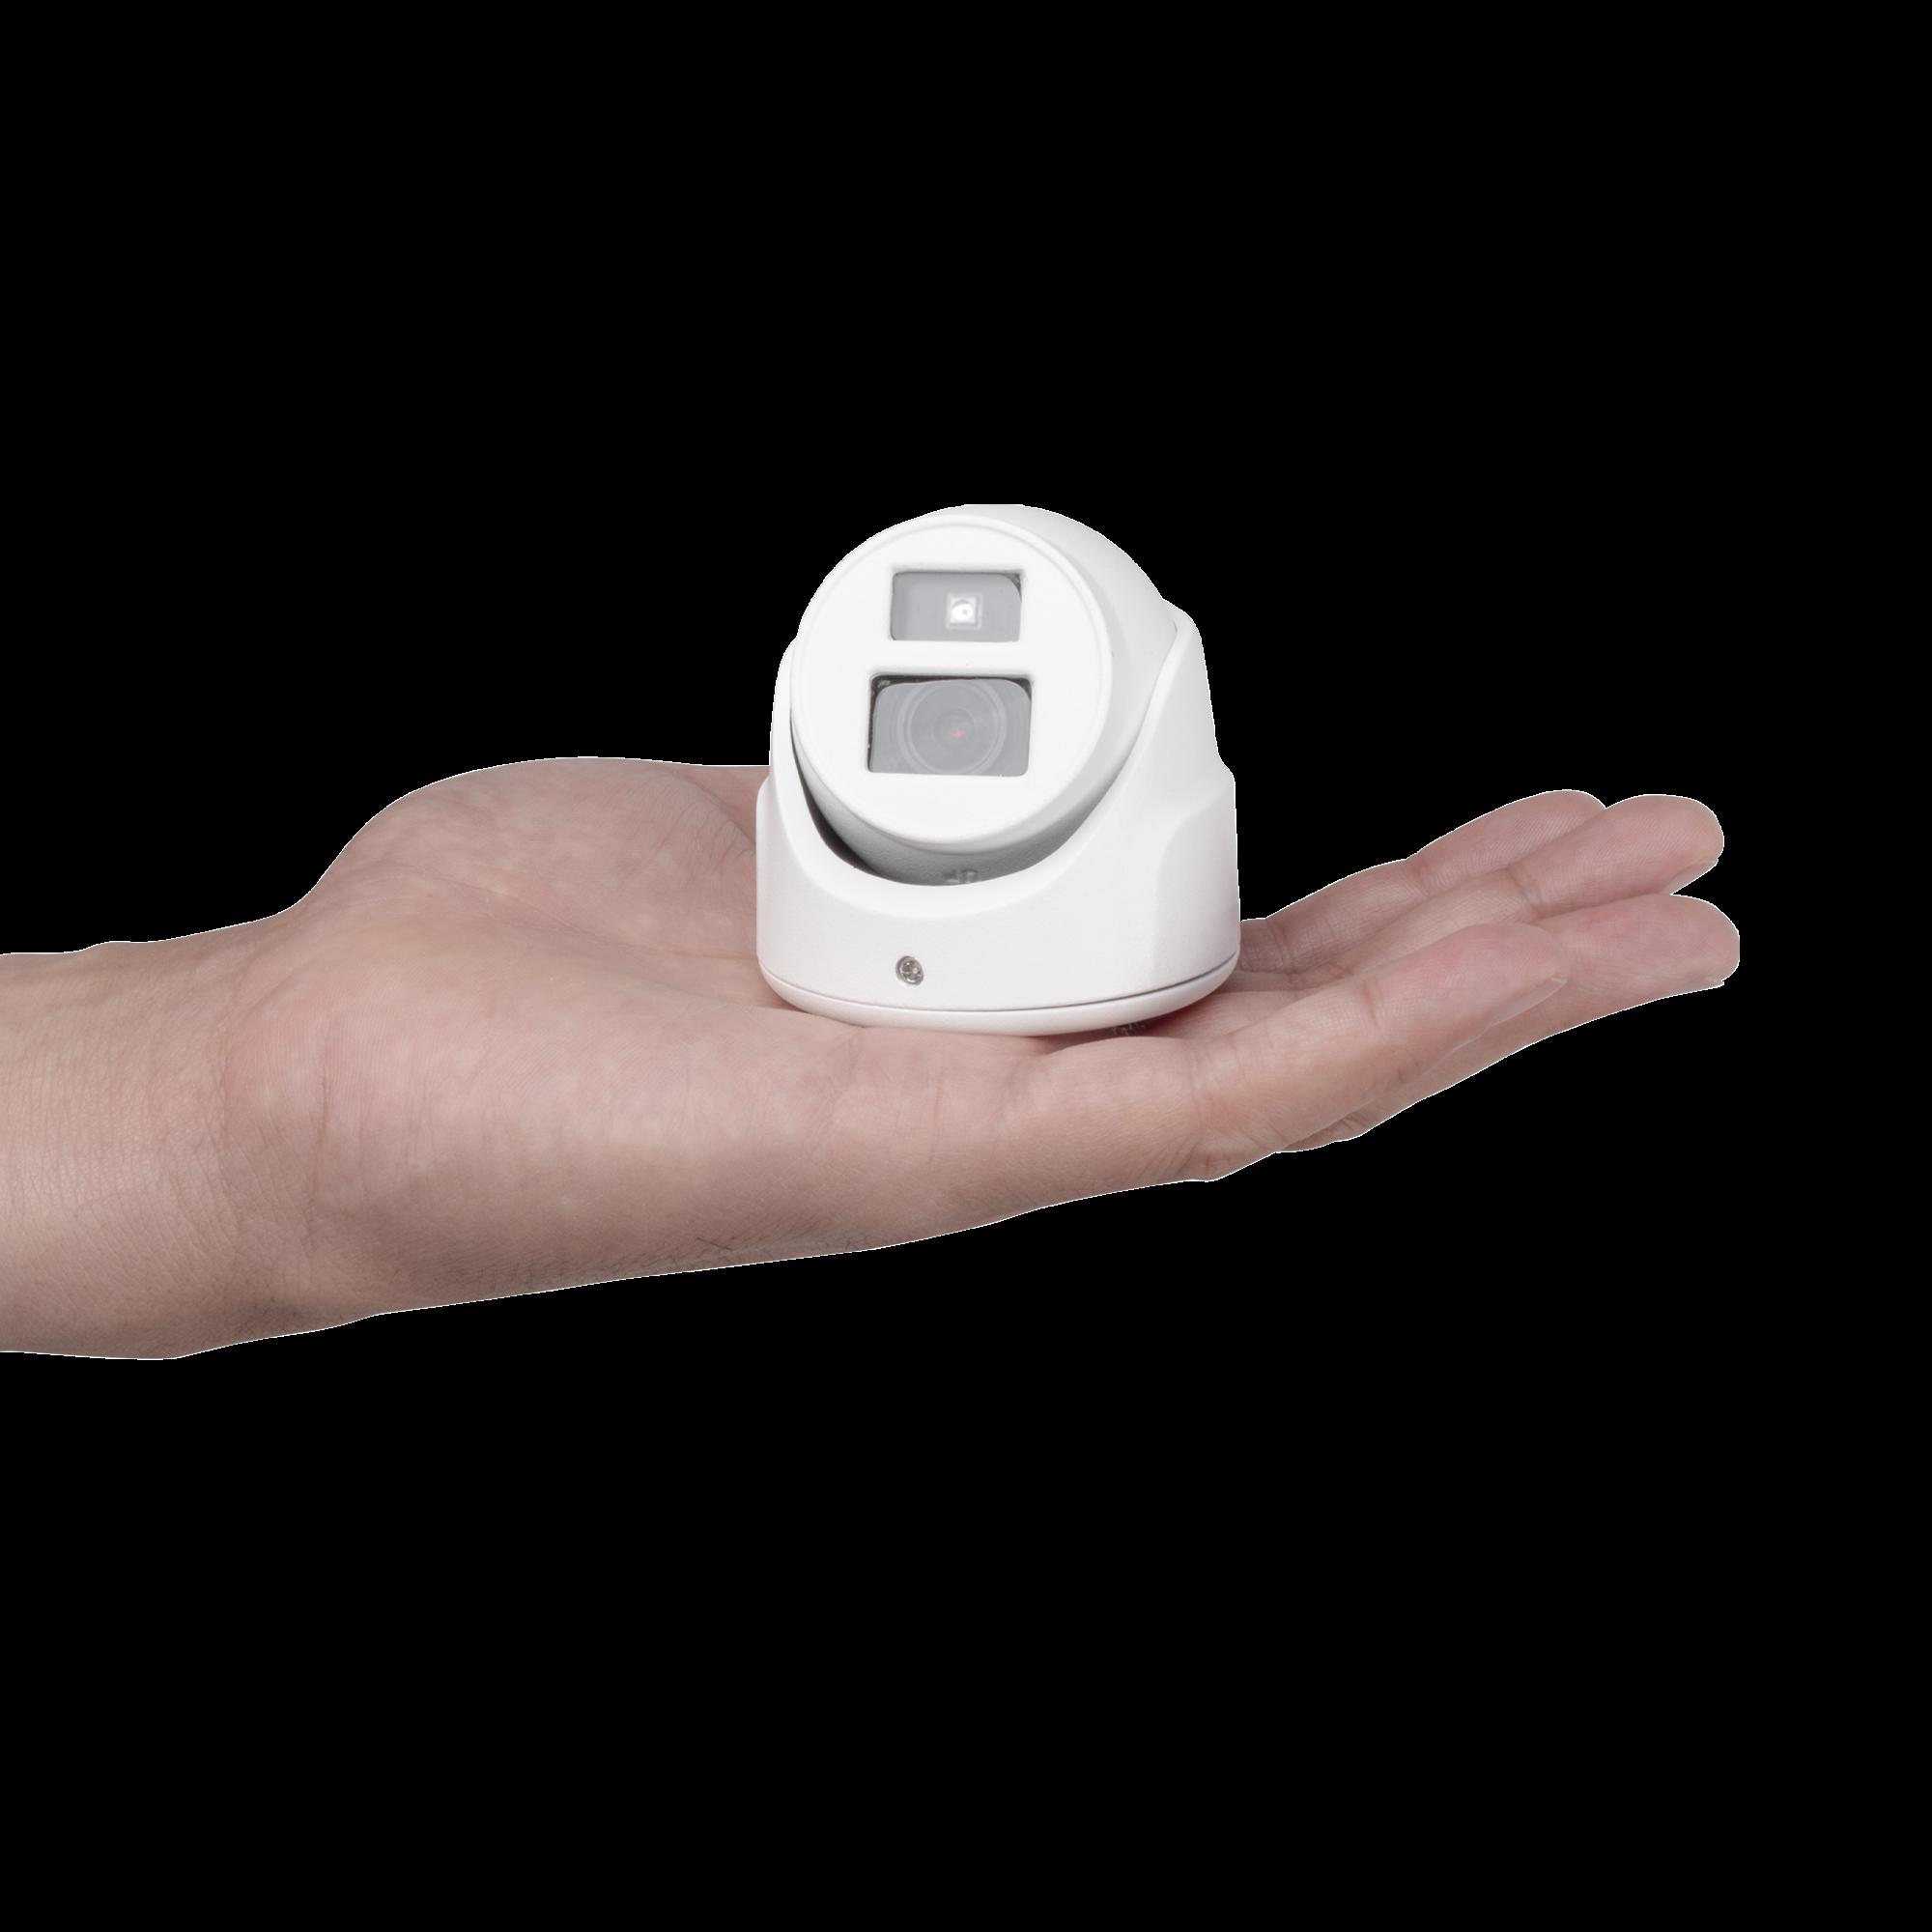 Ultra Mini Turret TURBO 2 Megapixel (1080p) / Gran Angular / Lente 2.8 mm / 20 mts IR EXIR / Exterior IP67 / 4 Tecnologías (TVI / AHD / CVBS) / dWDR